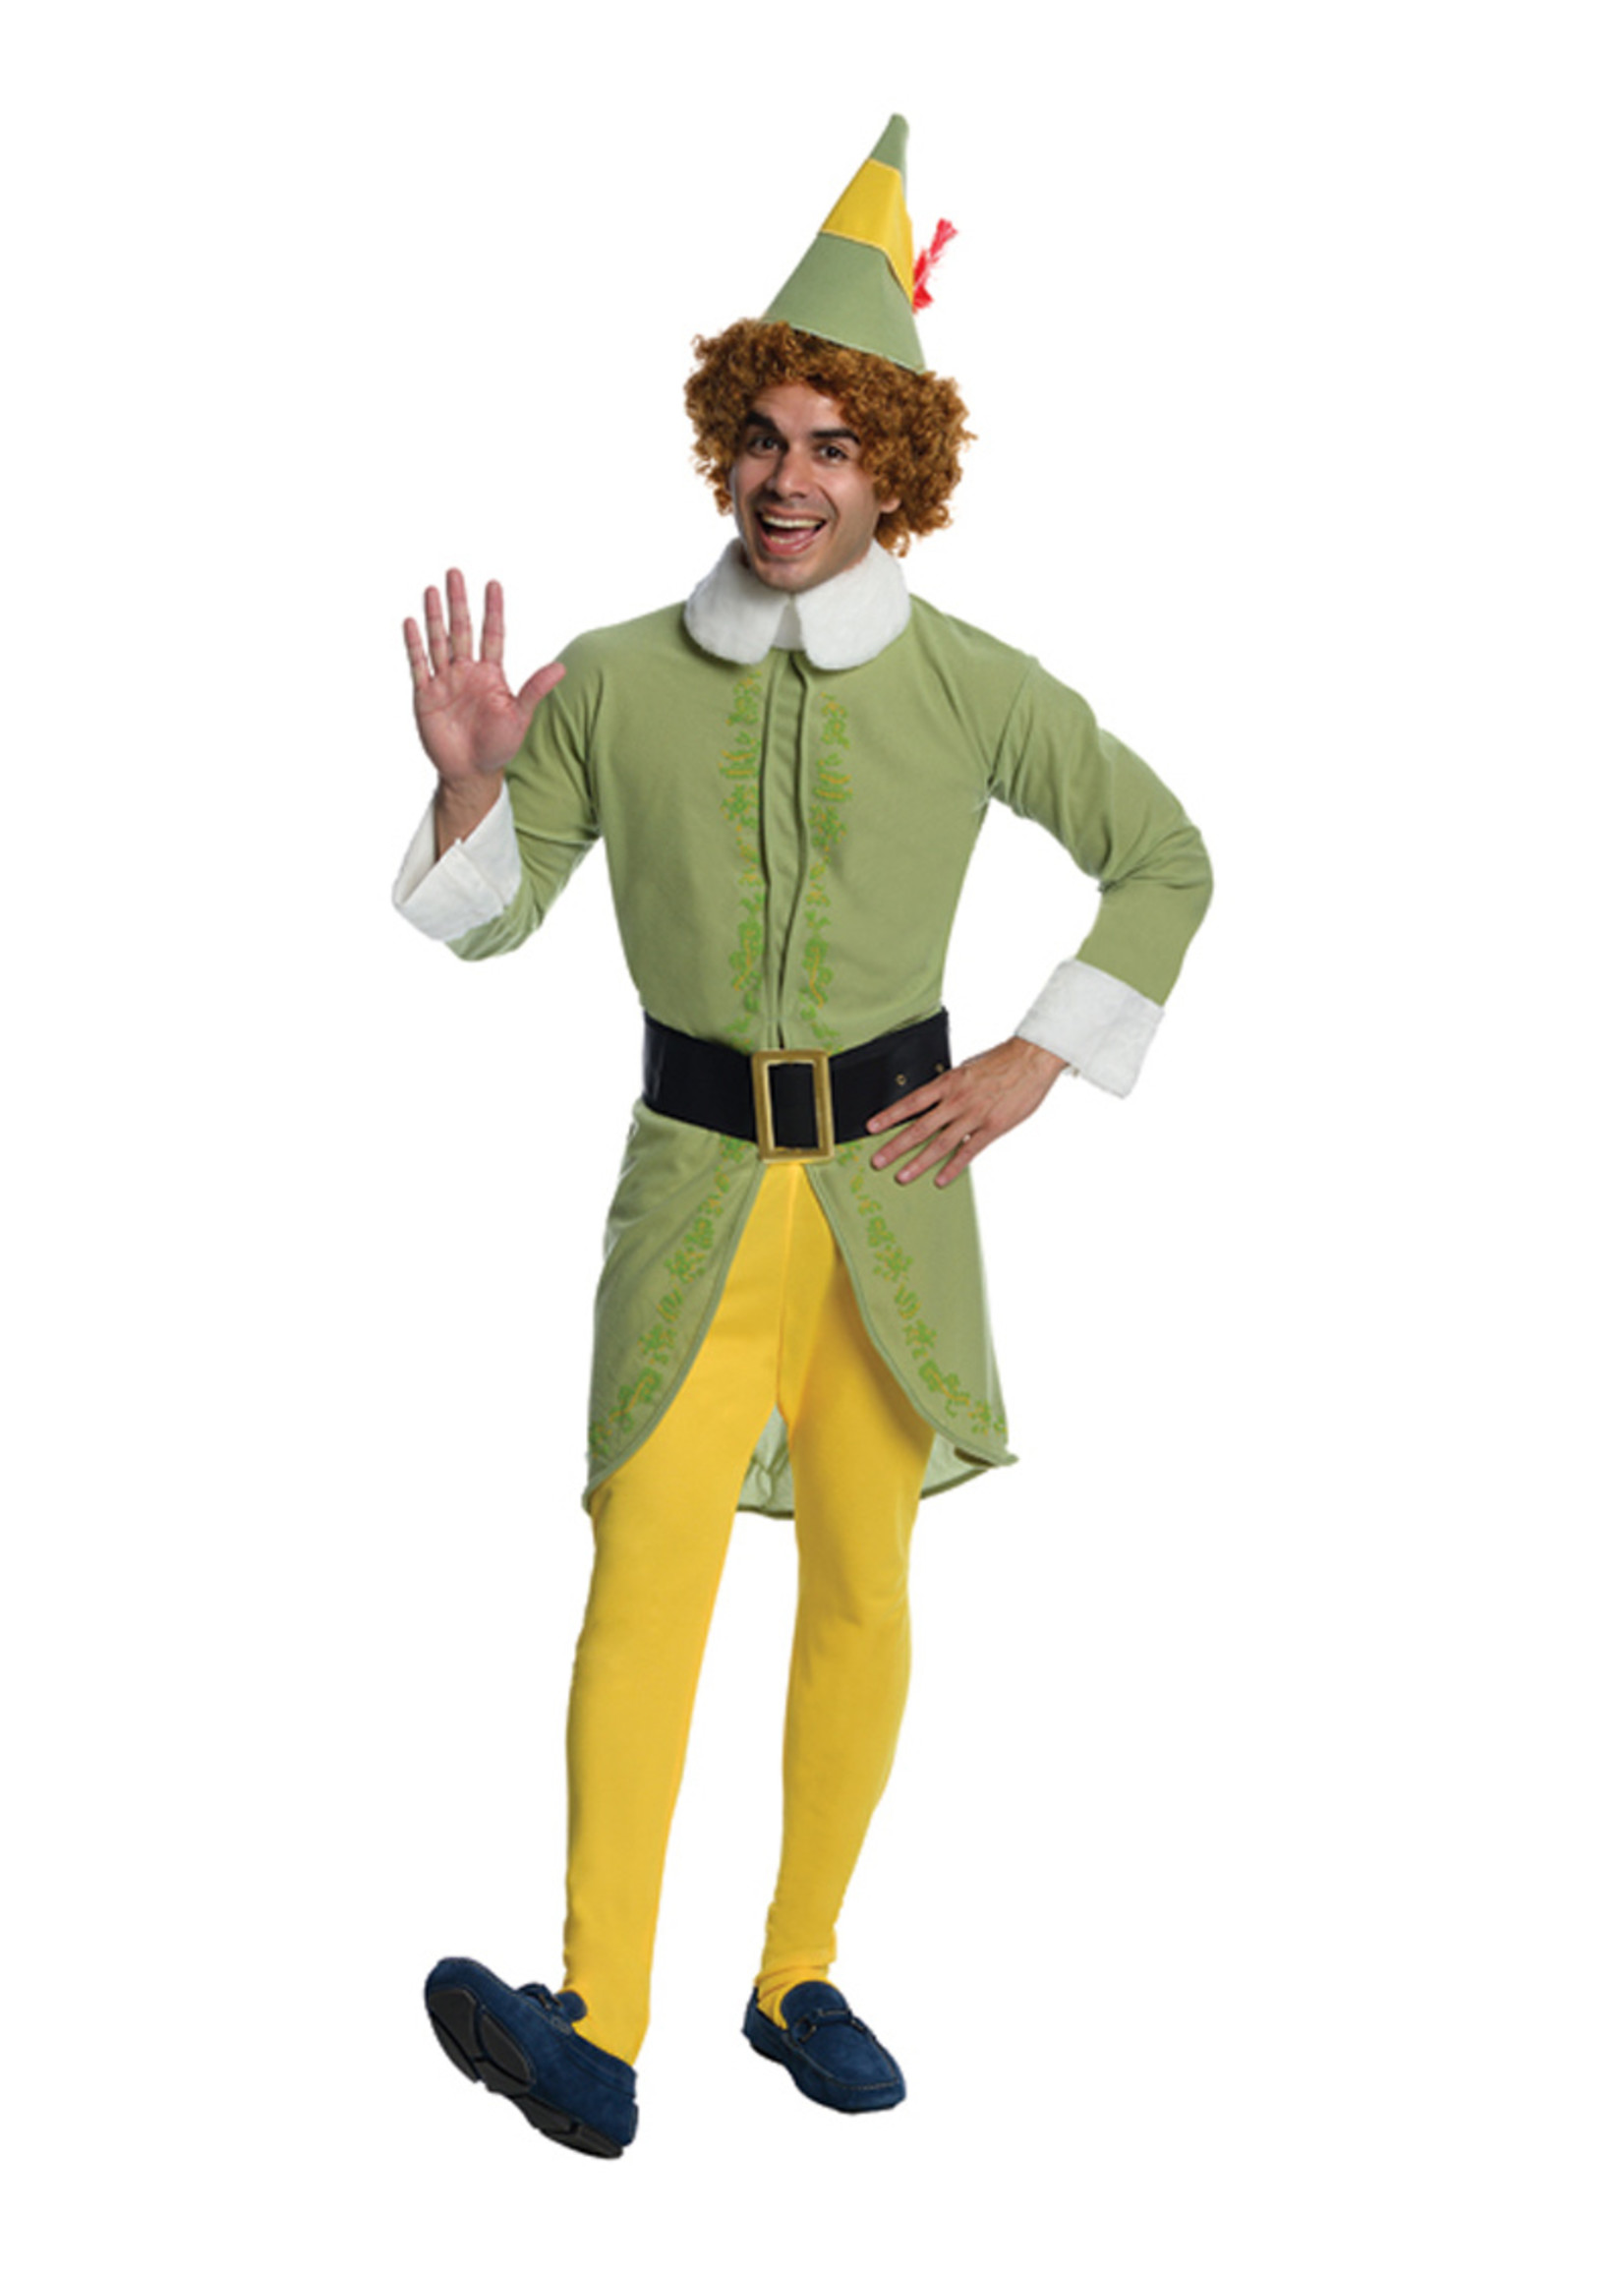 Buddy the Elf Costume - Men's